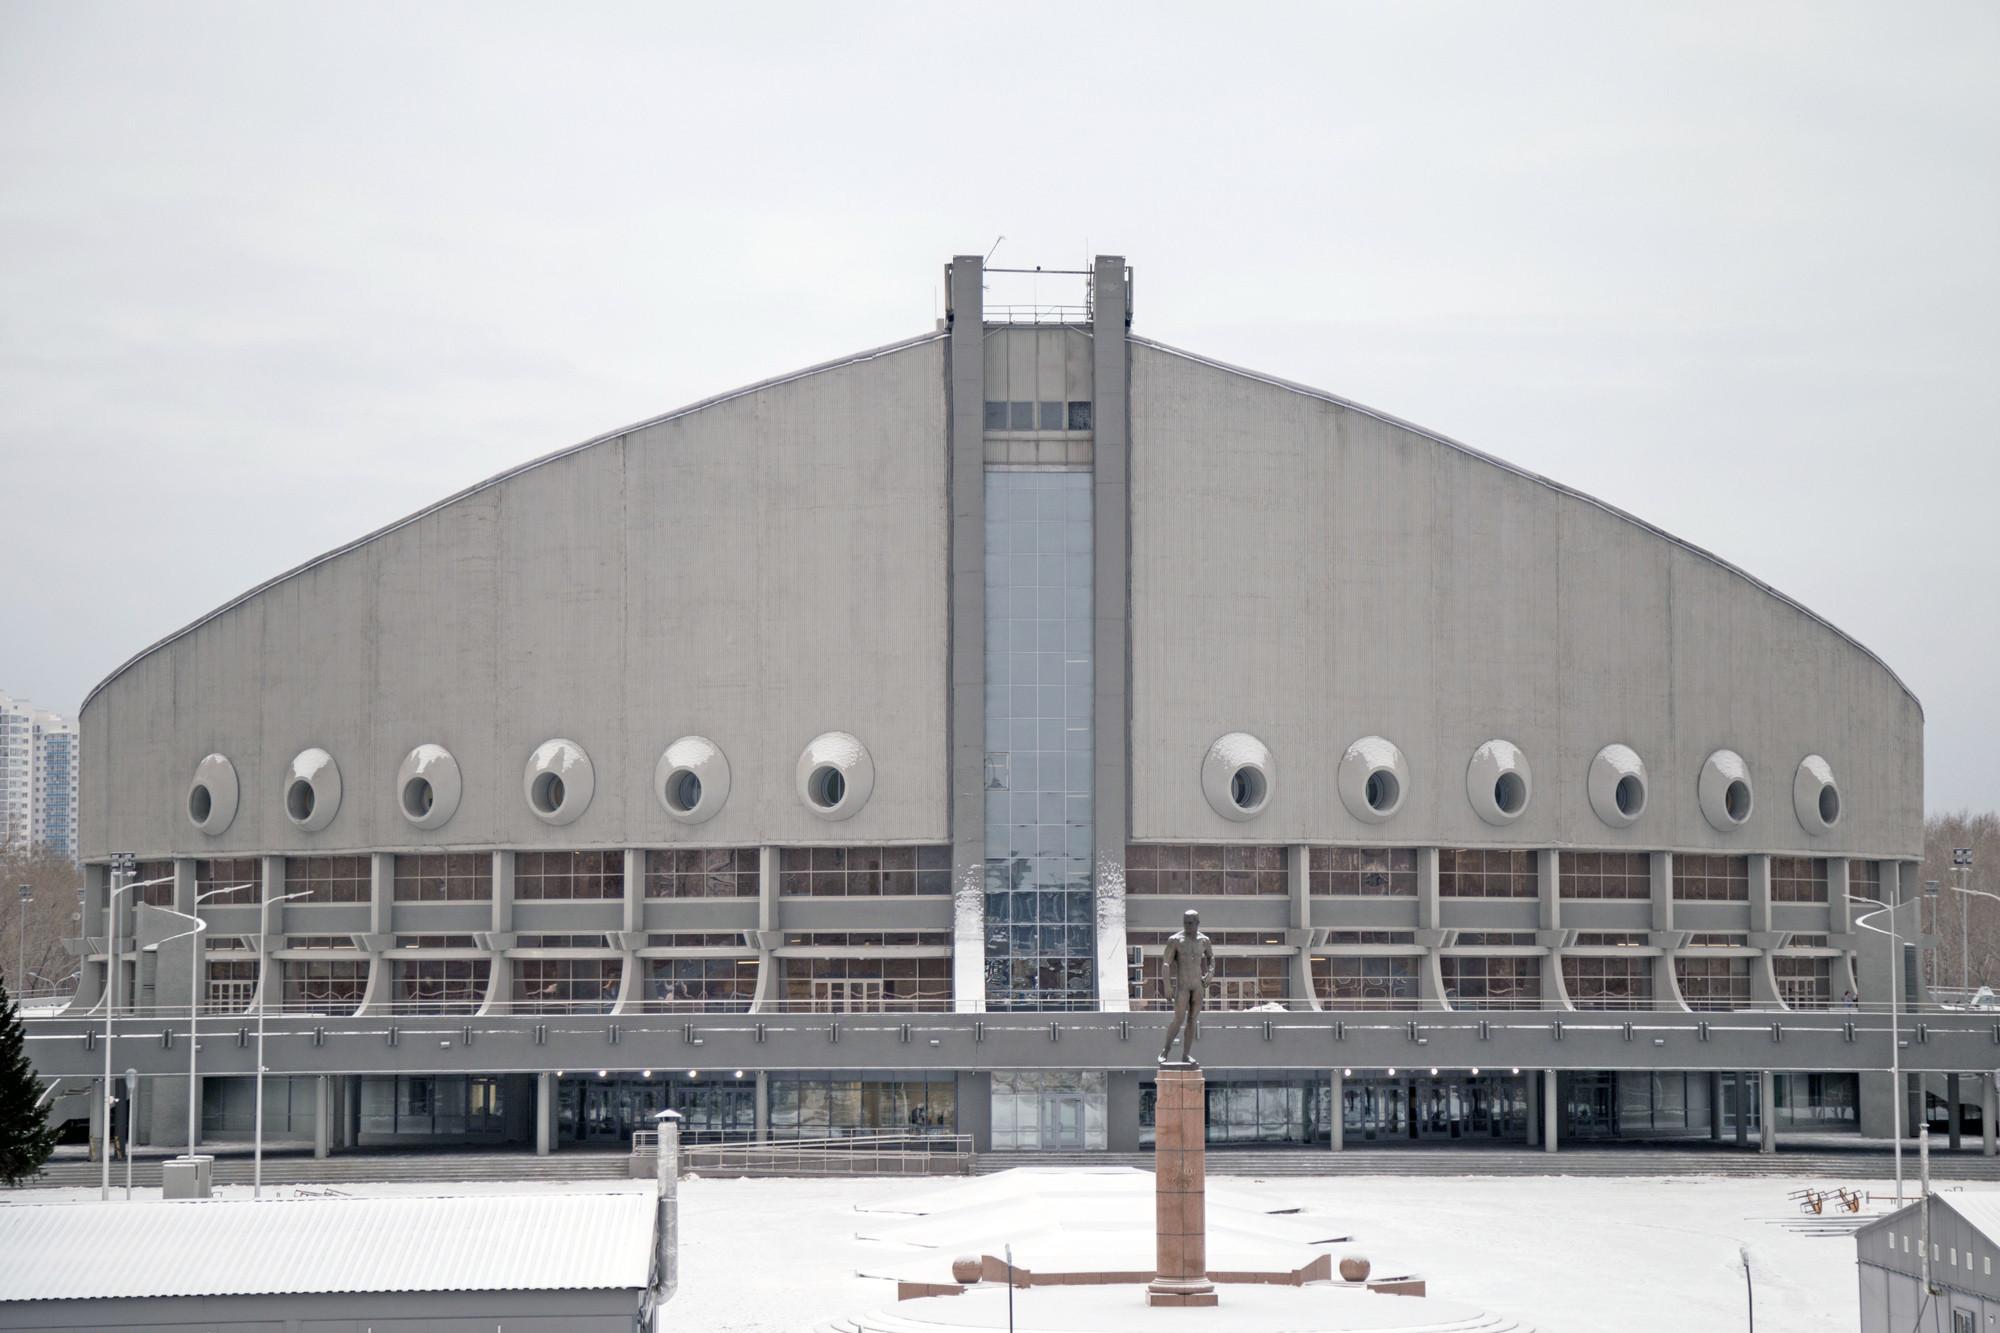 Krasnoyarsk 2019 curling venue becomes home to volleyball club